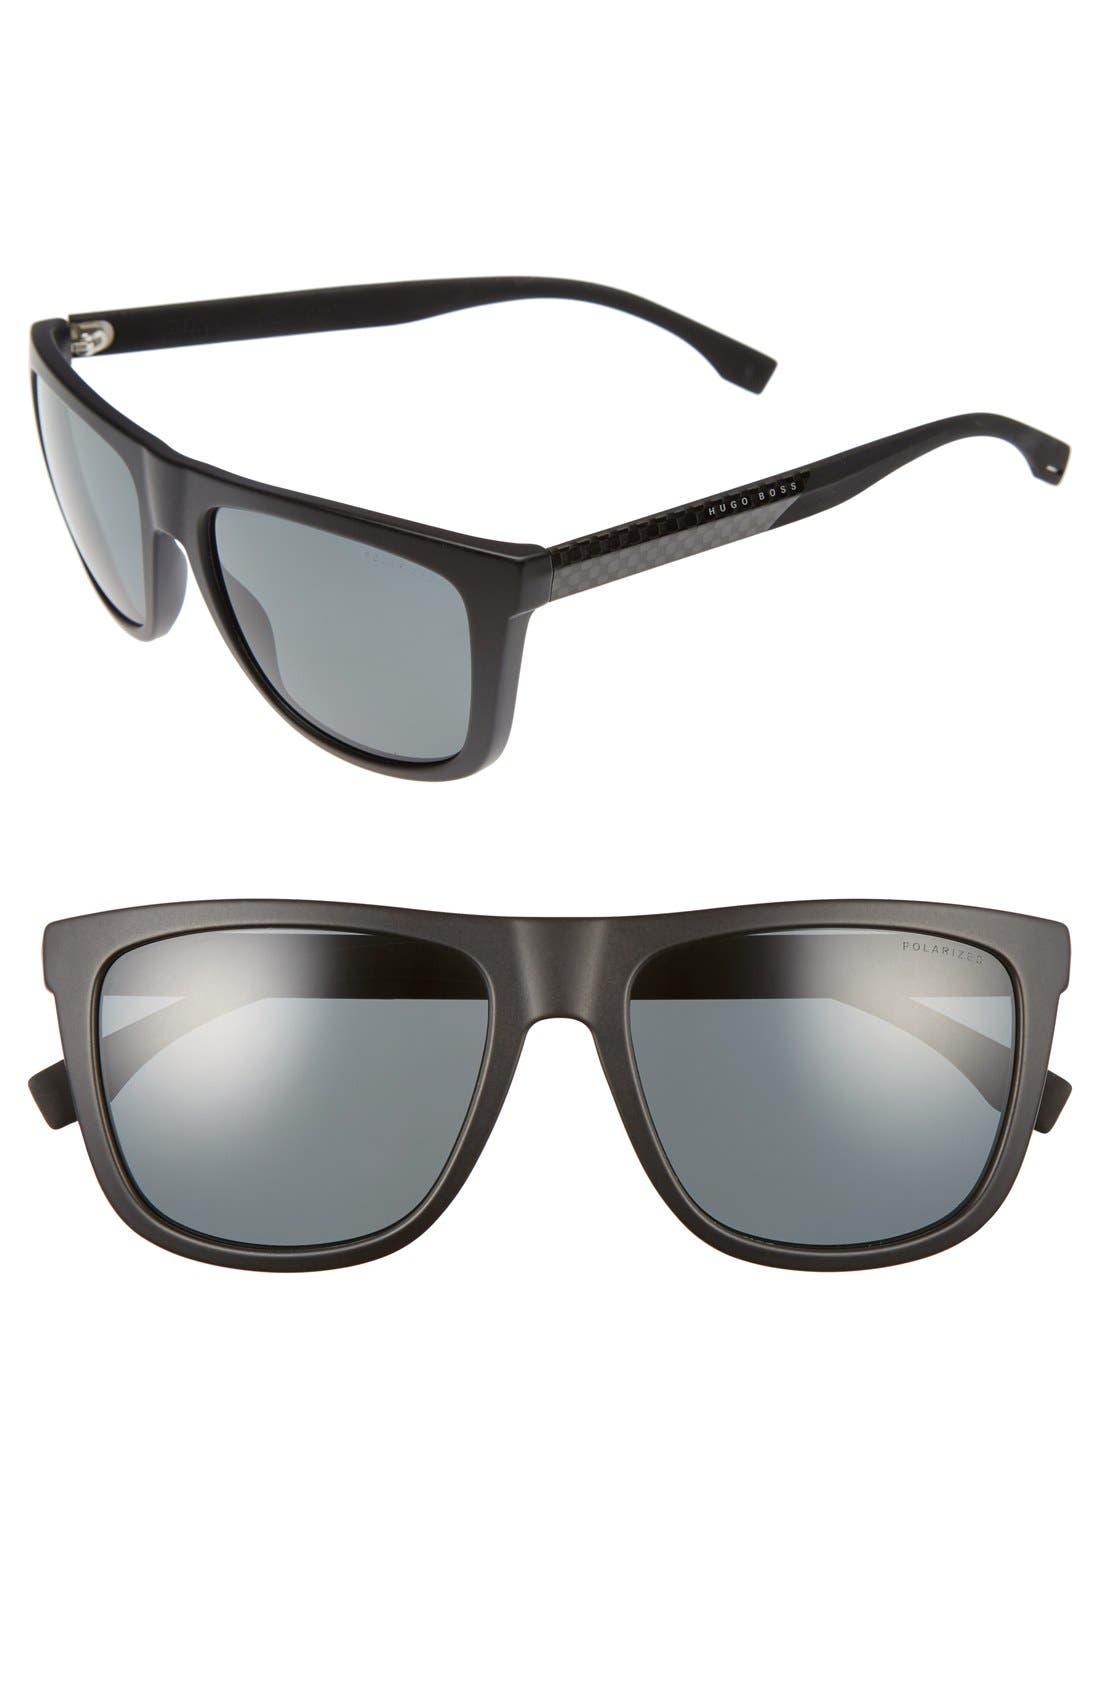 56mm Polarized Sunglasses,                             Main thumbnail 1, color,                             001